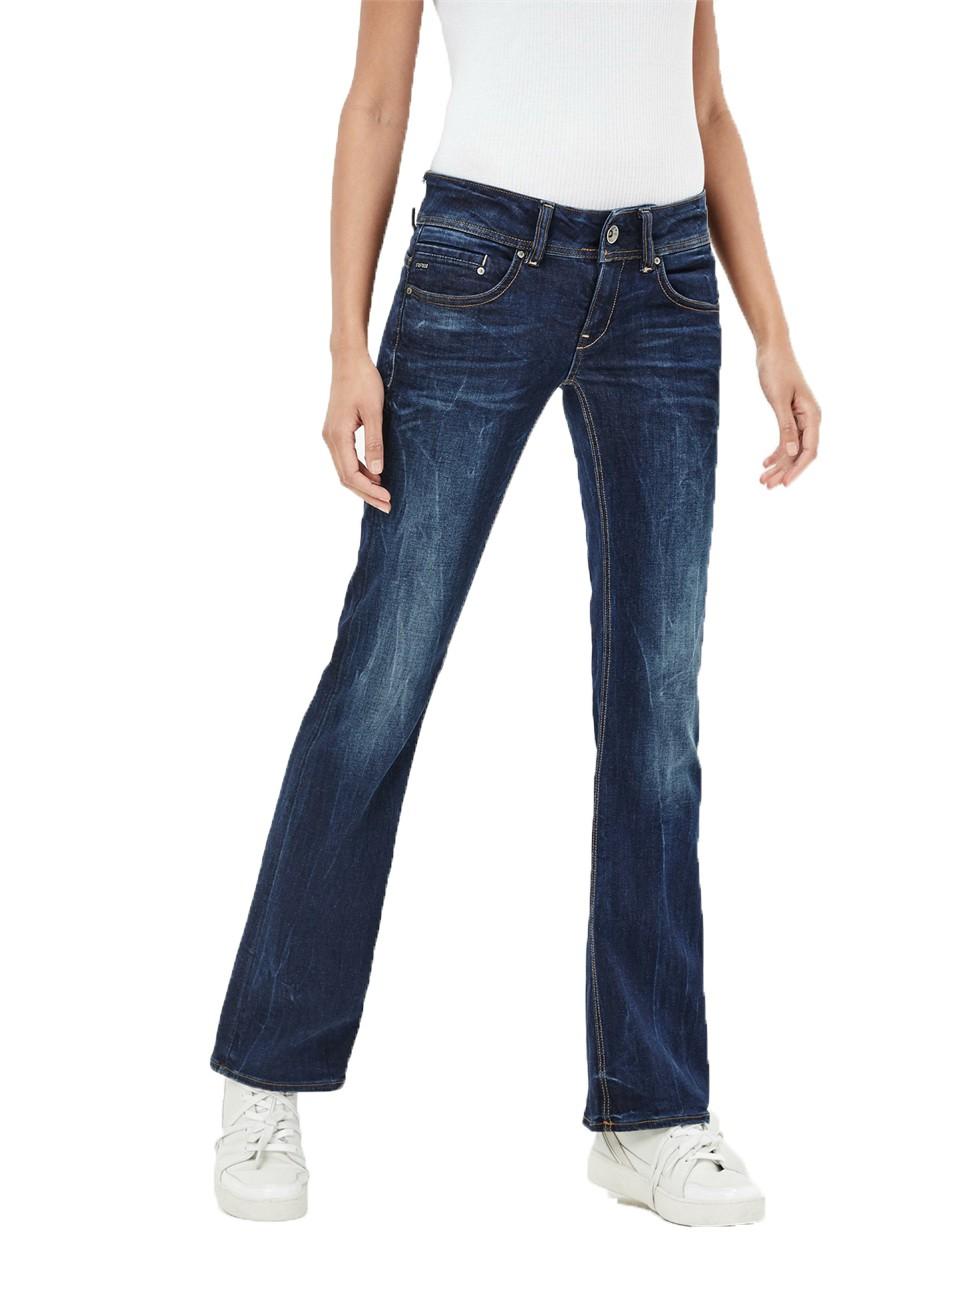 g star damen jeans midge saddle bootleg blau dark aged. Black Bedroom Furniture Sets. Home Design Ideas